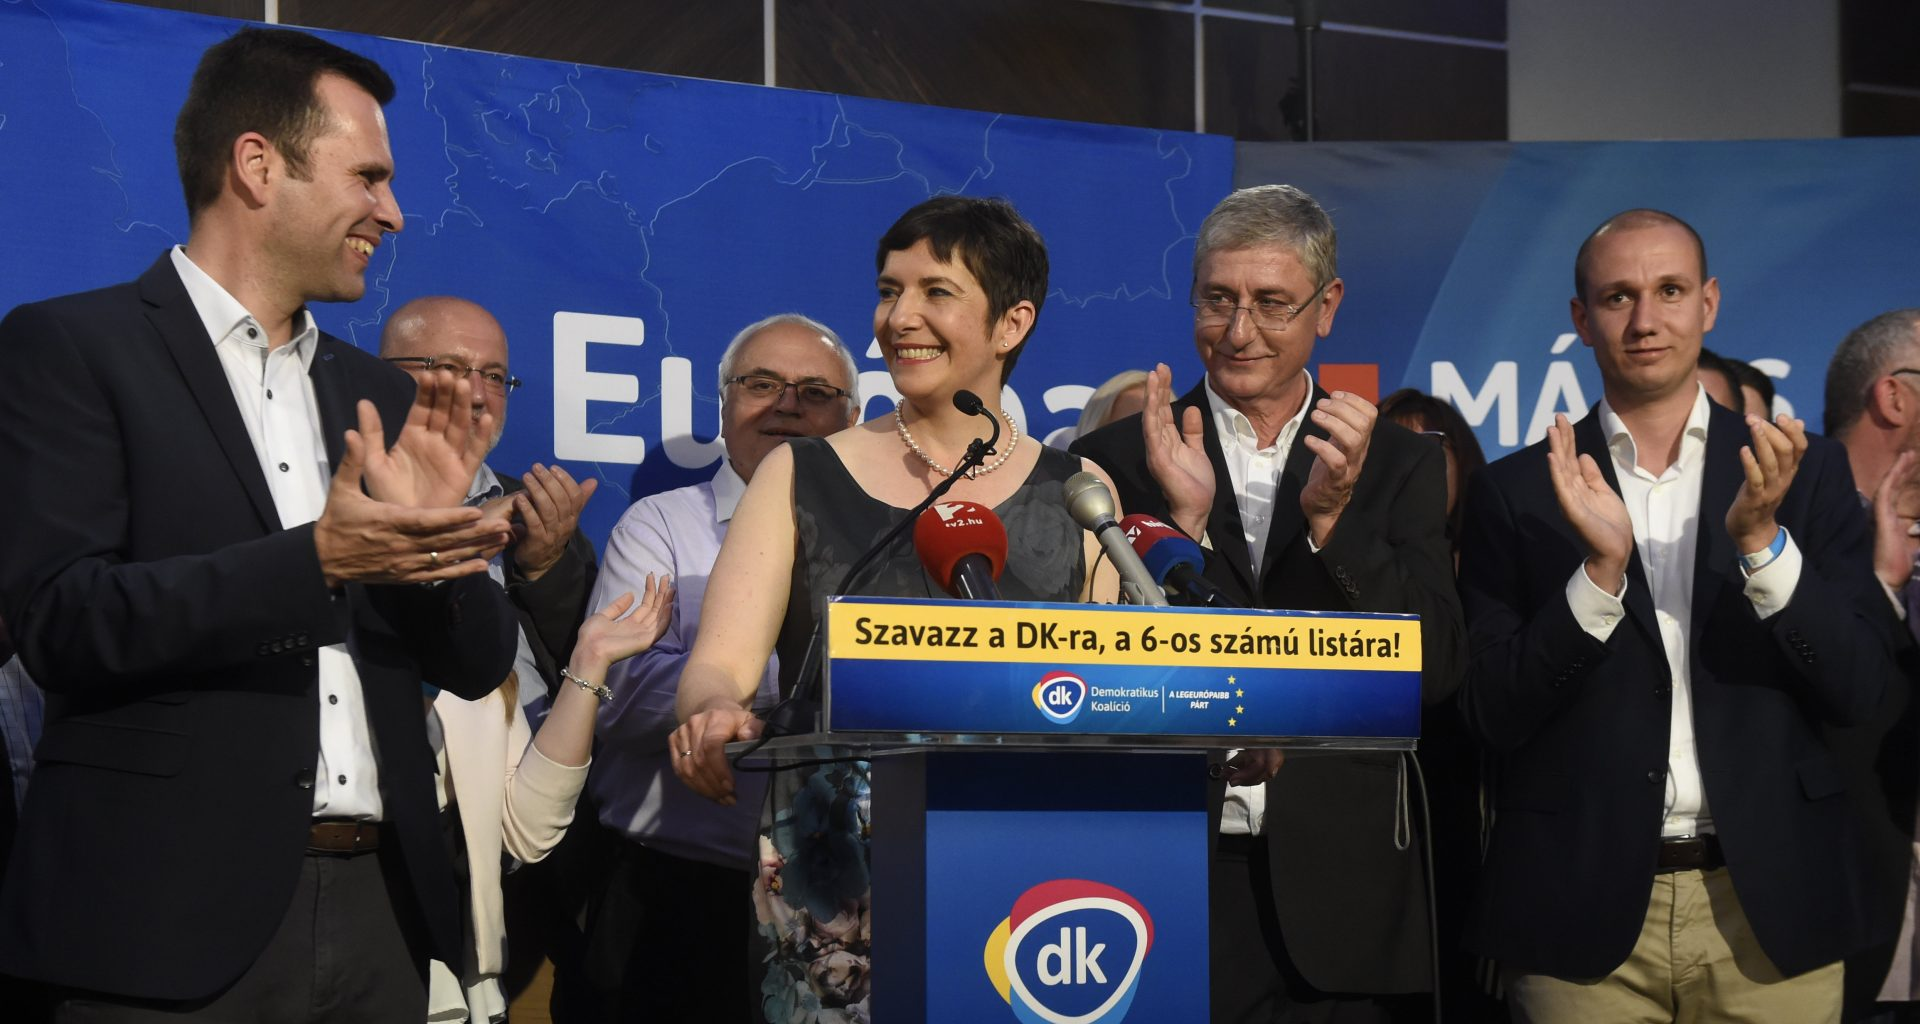 dk ep election 2019 dobrev